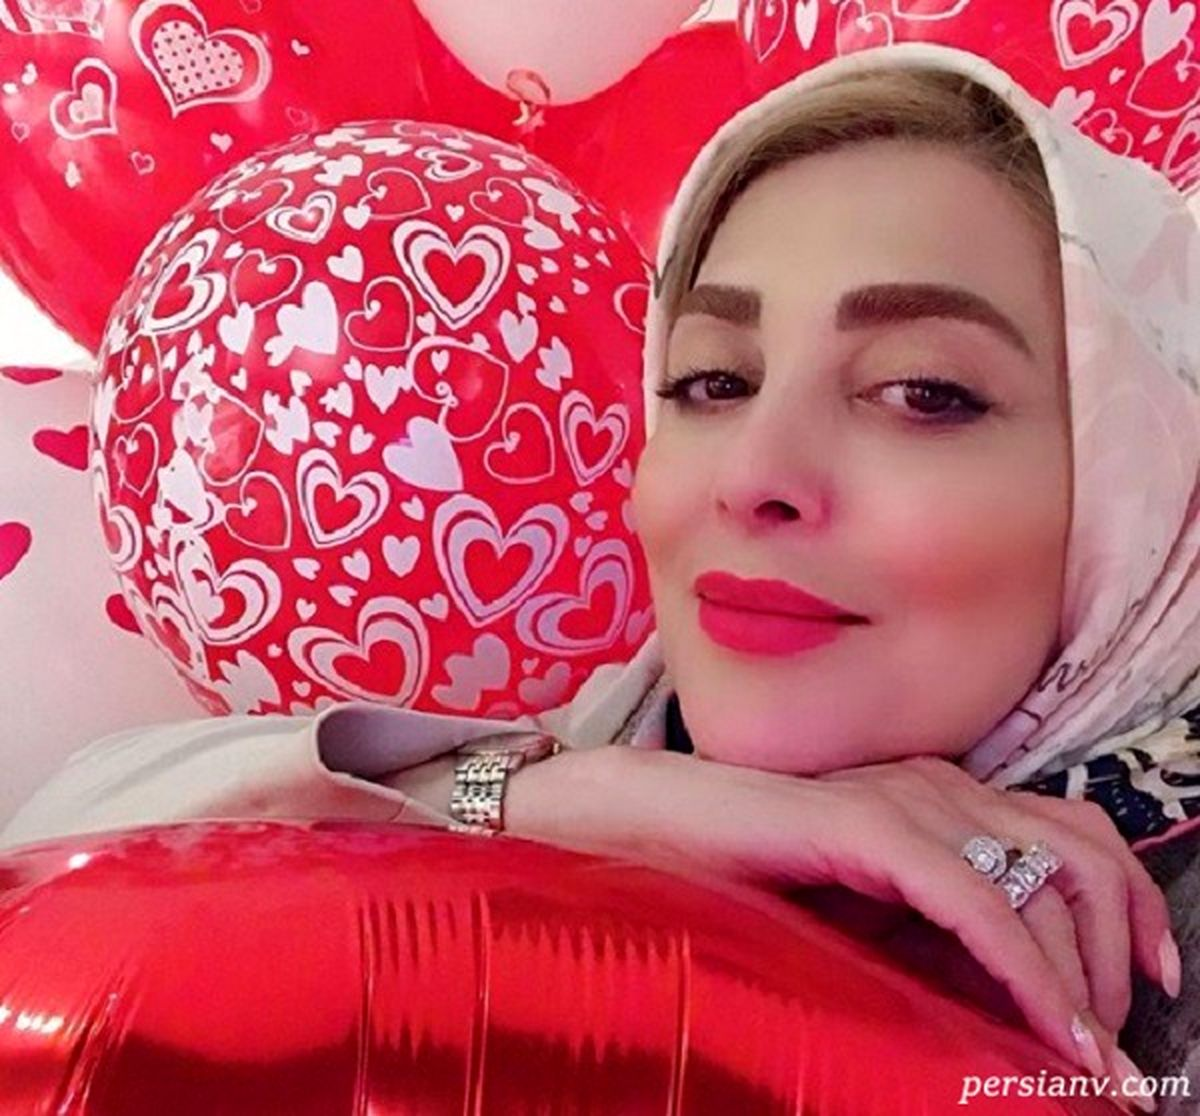 جشن تولد شیک و لاکچری ژیلا صادقی مجری معروف + تصاویر